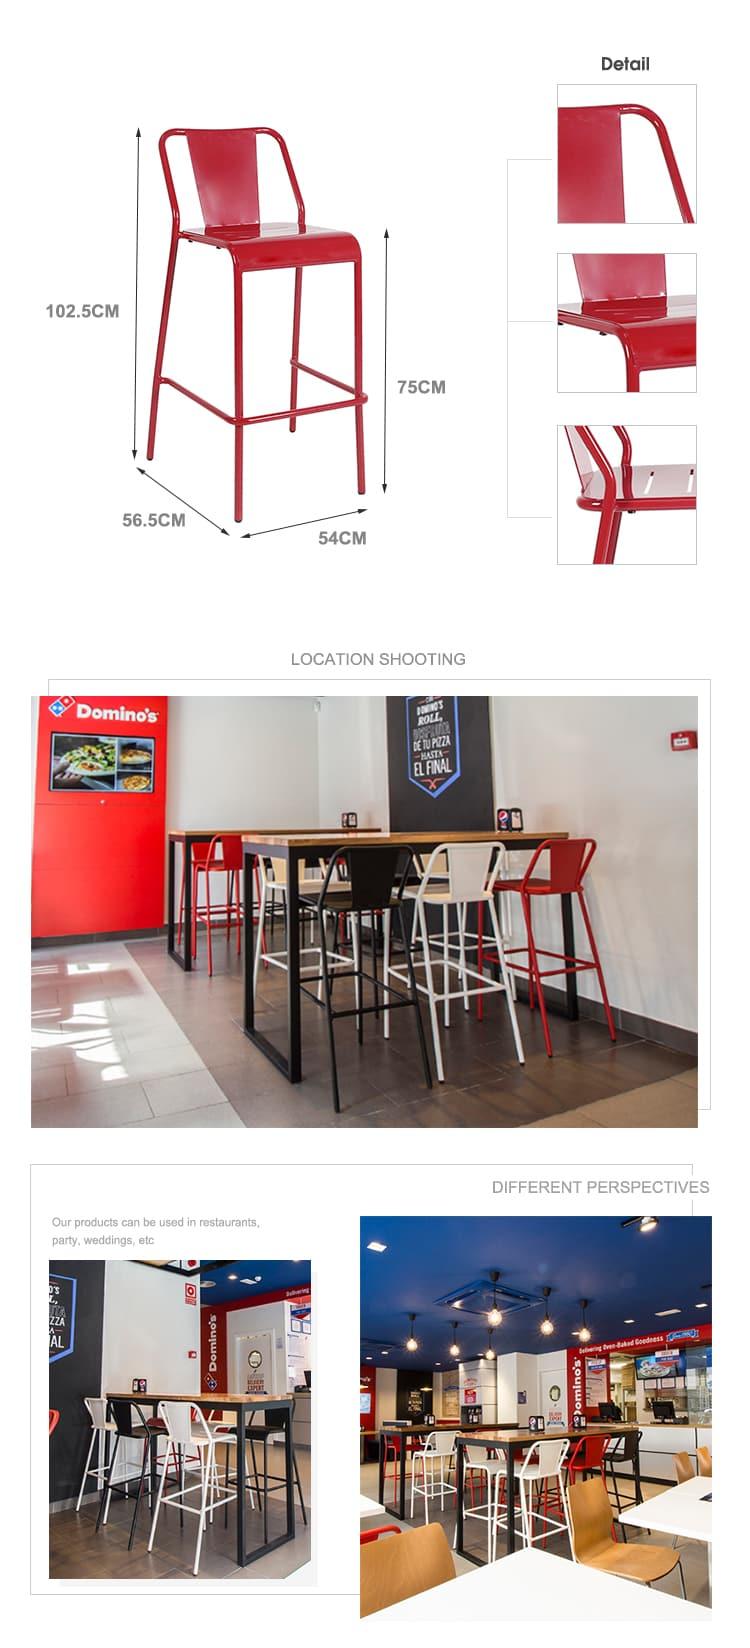 Sedia impilabile nordica per sala da pranzo da bistrot per ristorante industriale 796S-H45-ALU (2)